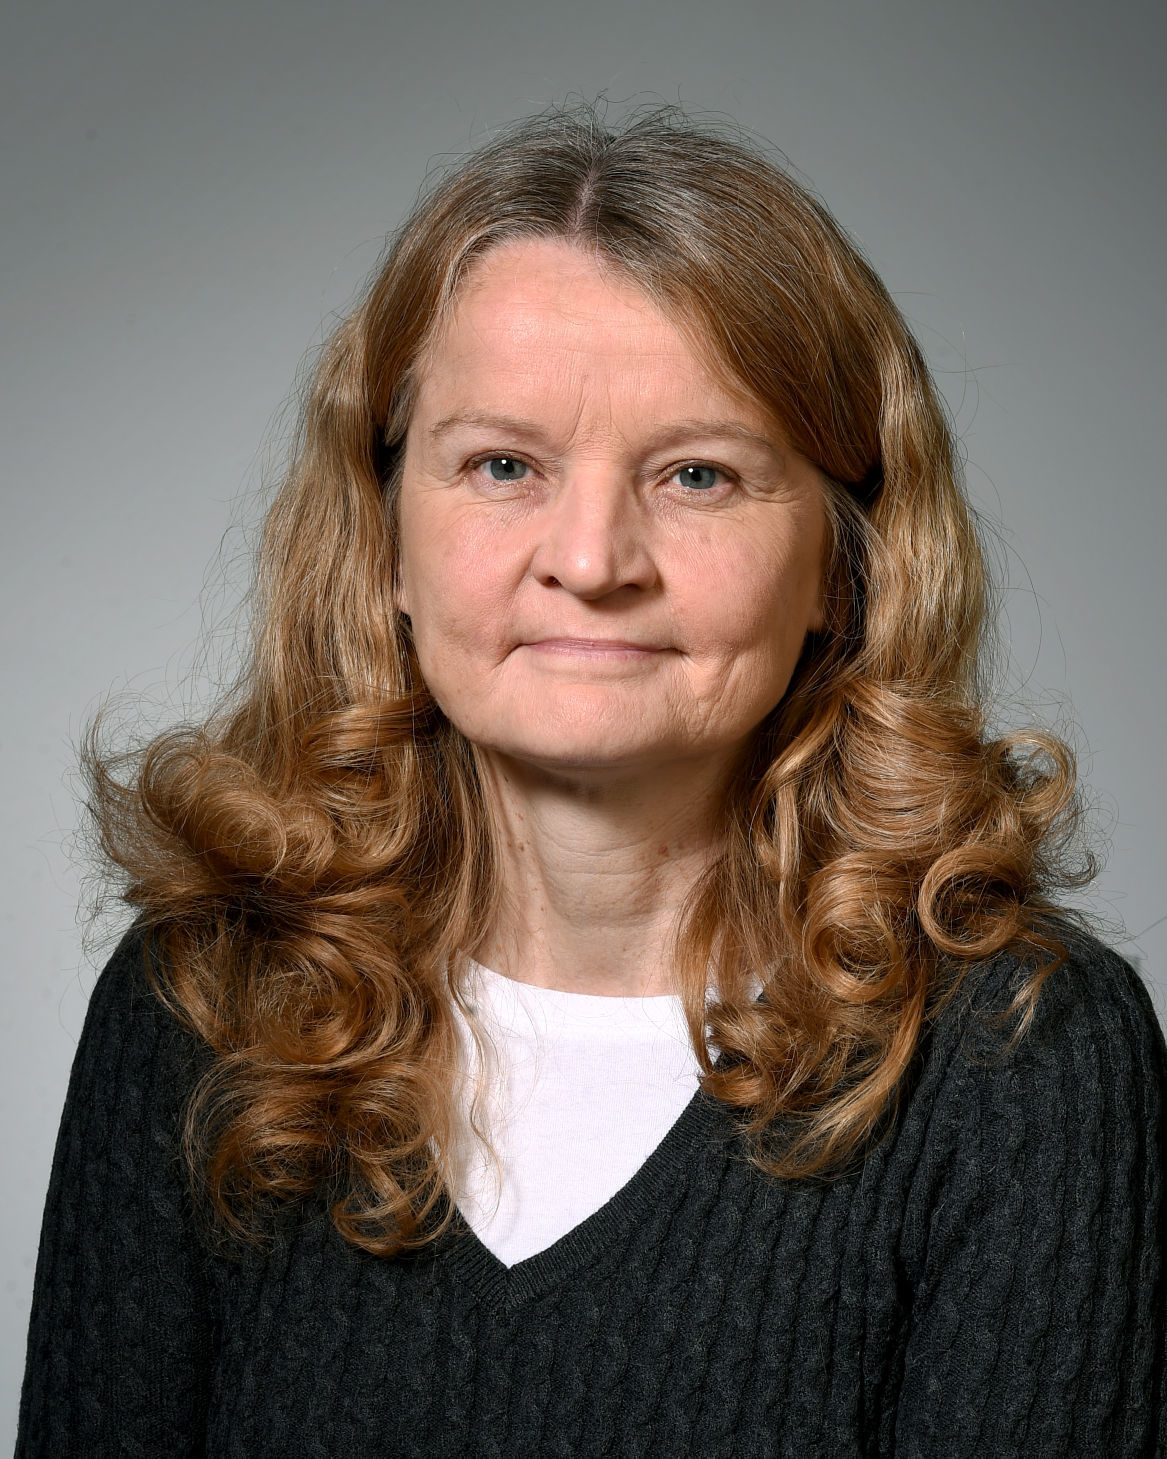 Jeanne Hilinske-Christensen